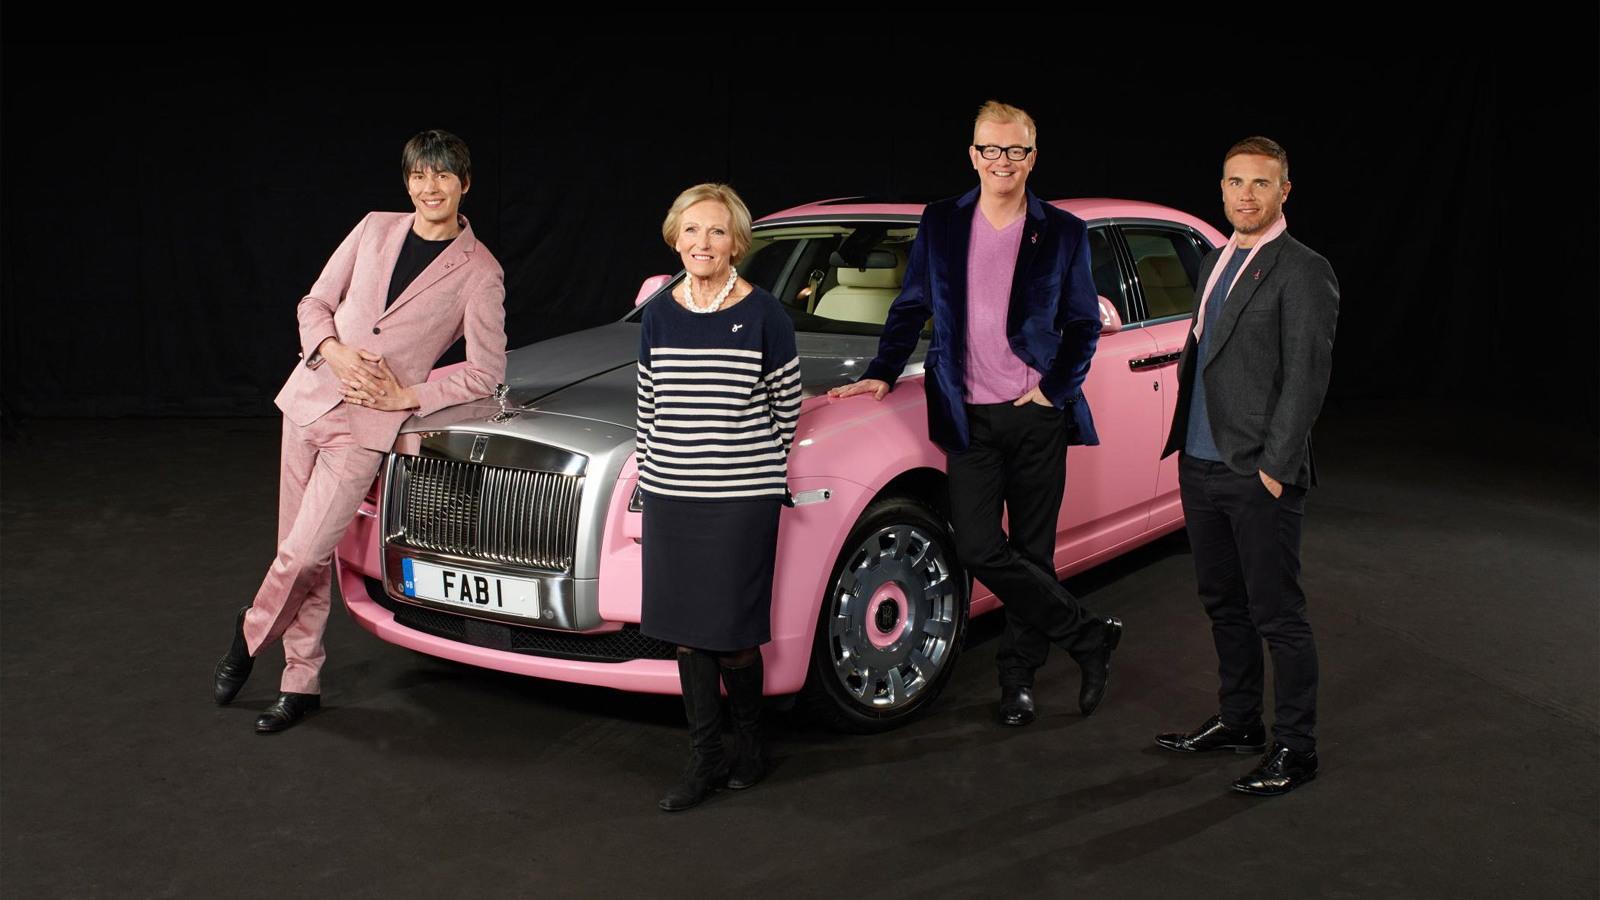 FAB1 pink Rolls-Royce Ghost Extended Wheelbase